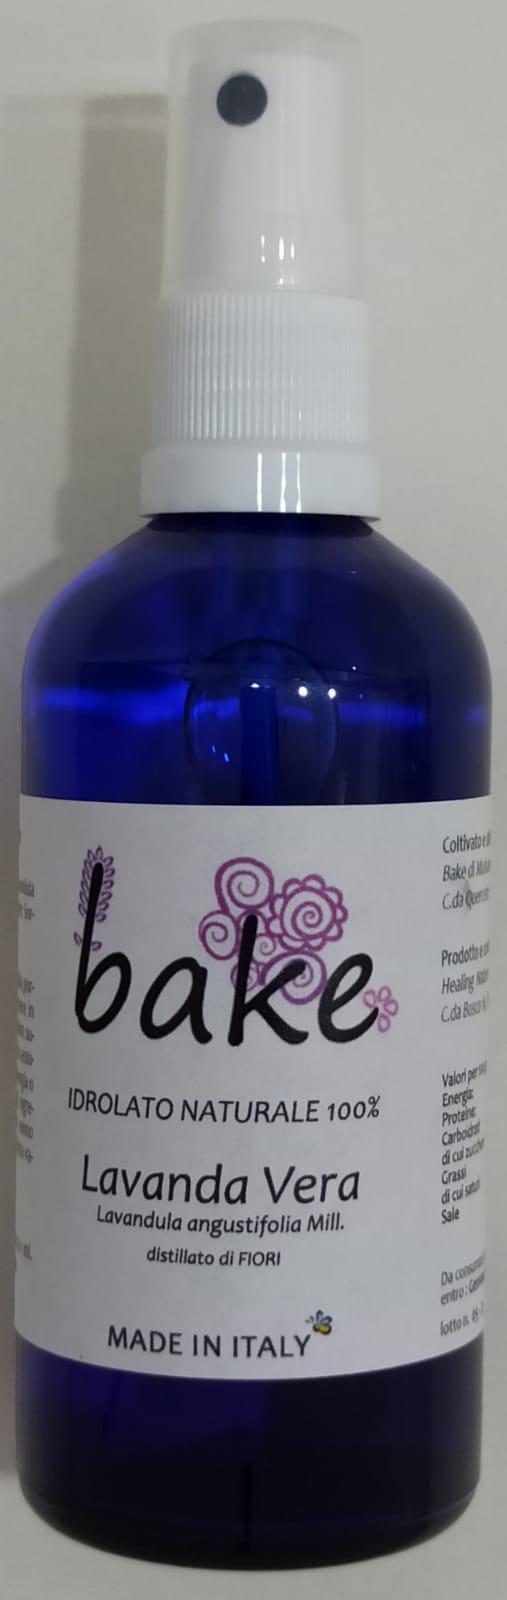 Bake - Idrolato di Lavanda